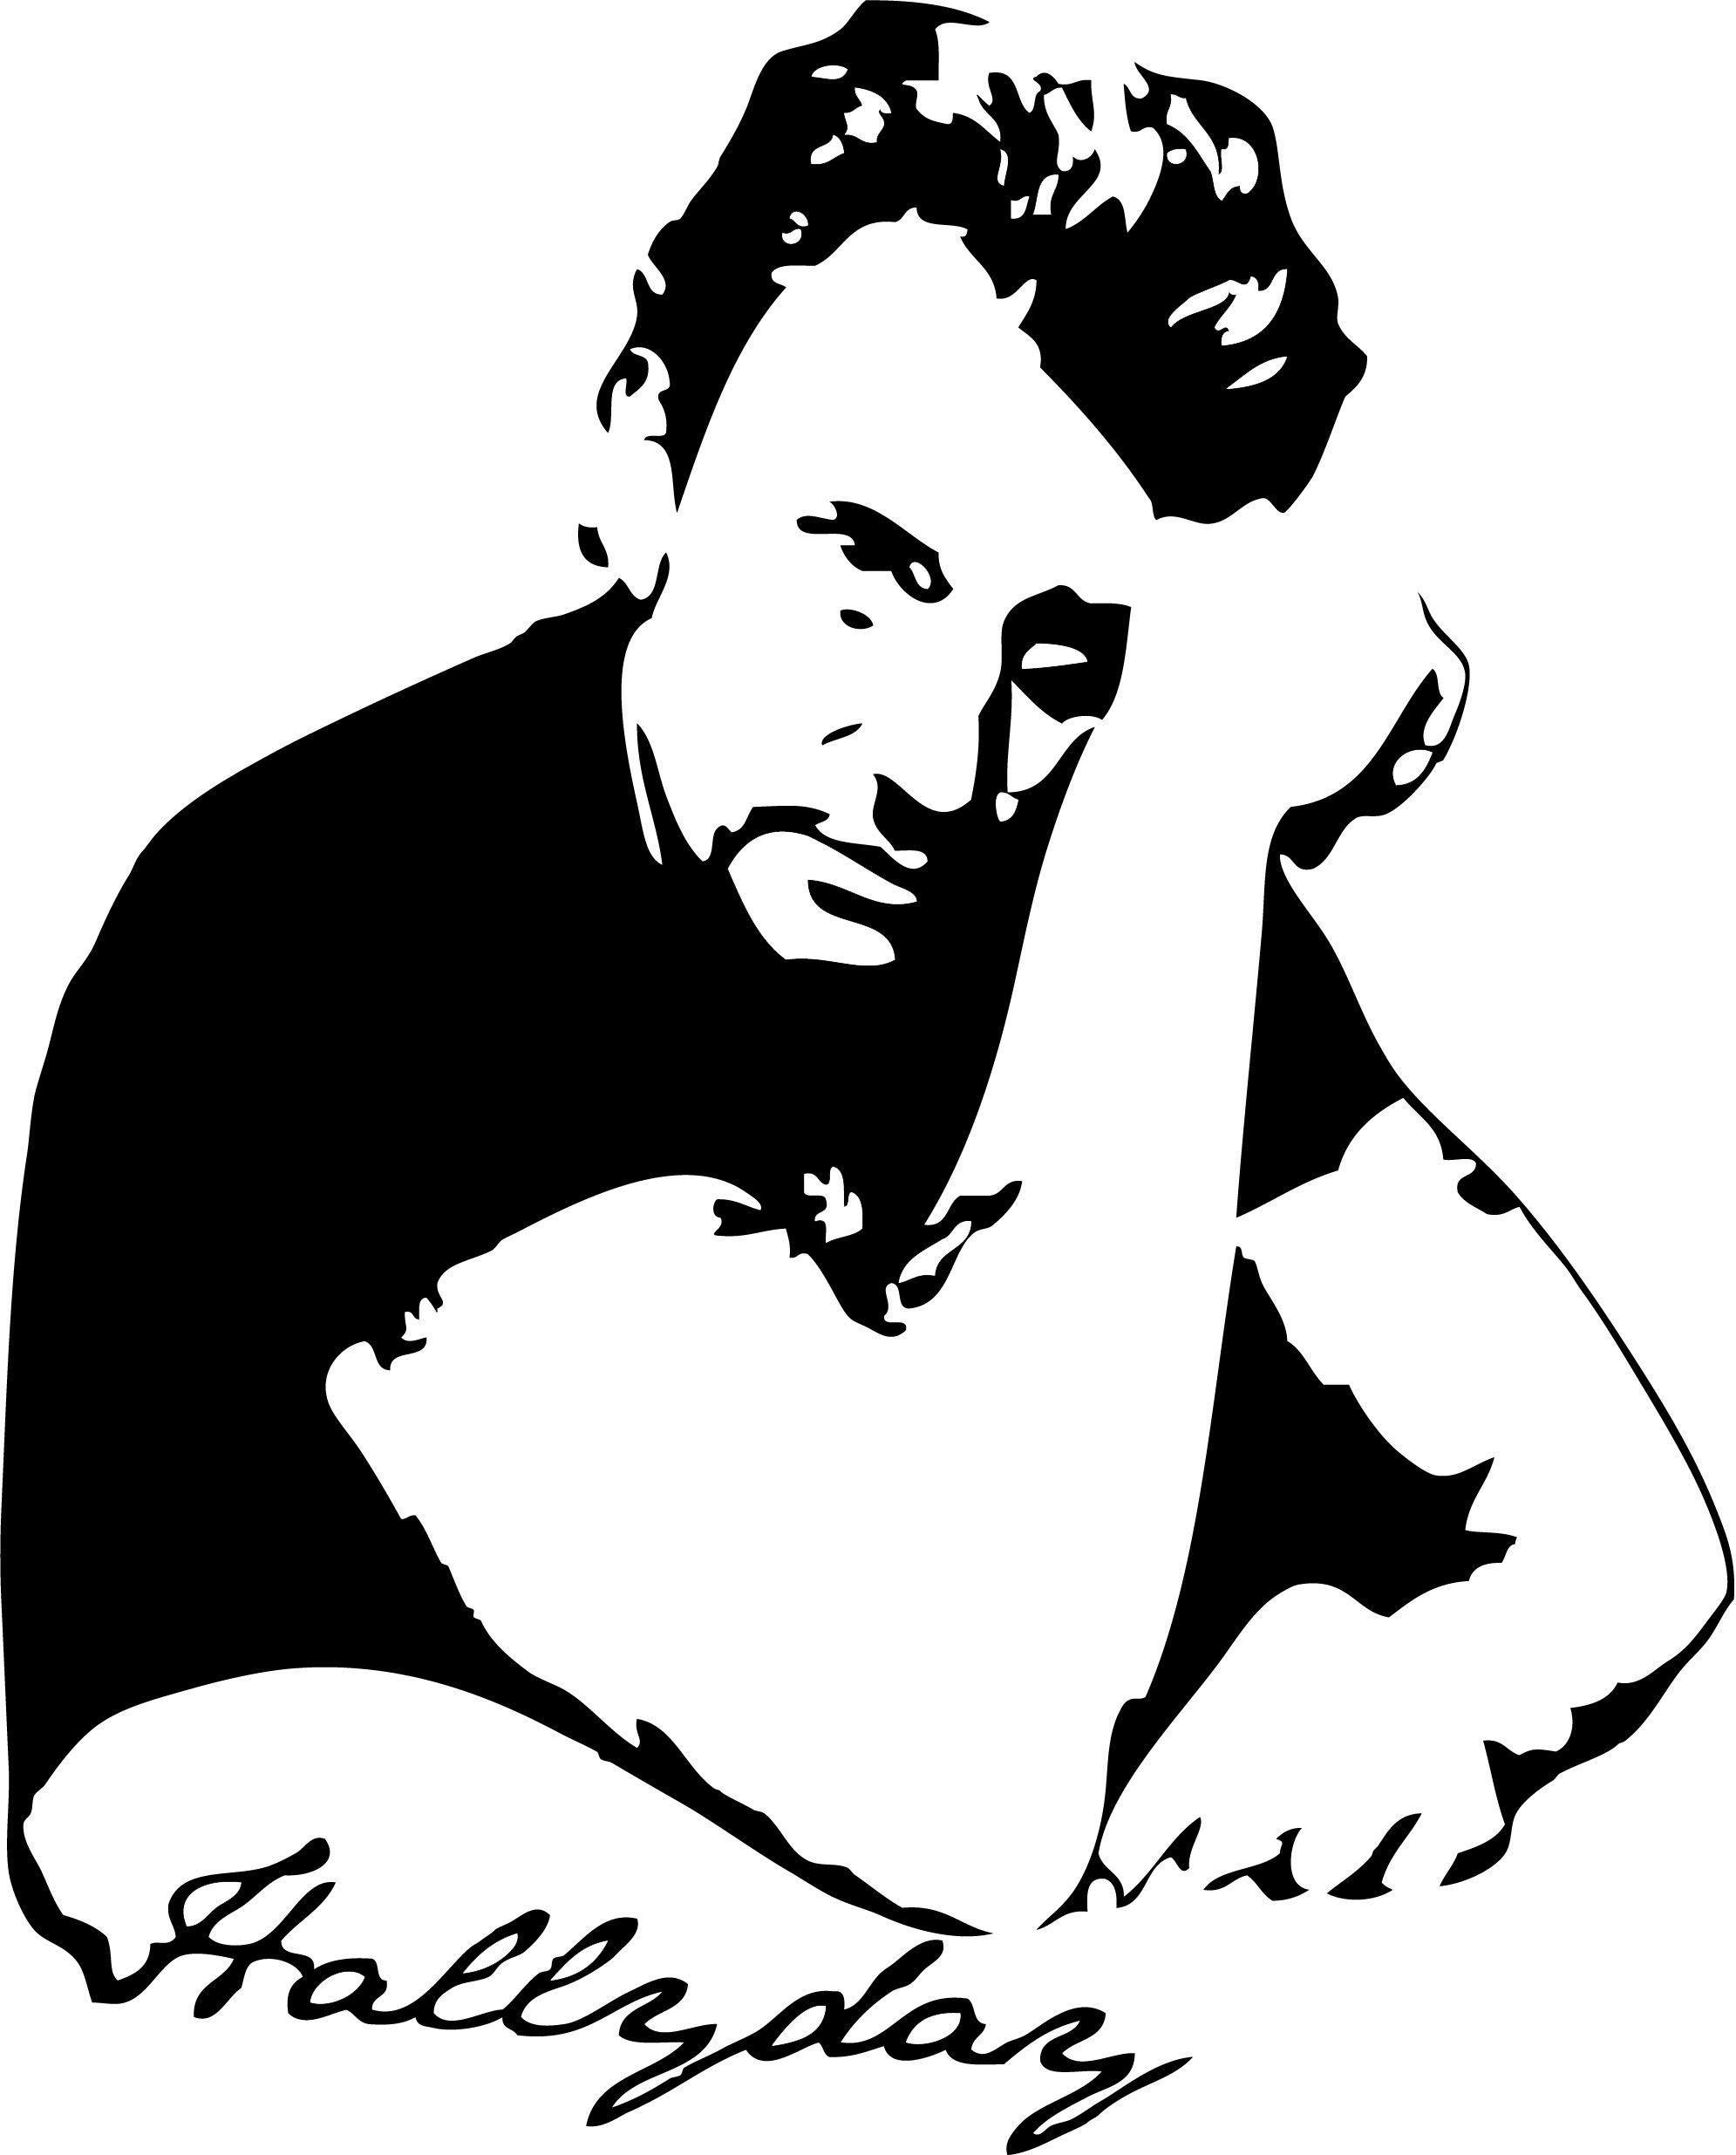 Sticker Johnny Halliday Avec Signature Musique Chanteurs Groupes Etc Destock Stickers Pochoirs Visage Johnny Hallyday Pochoir Silhouette